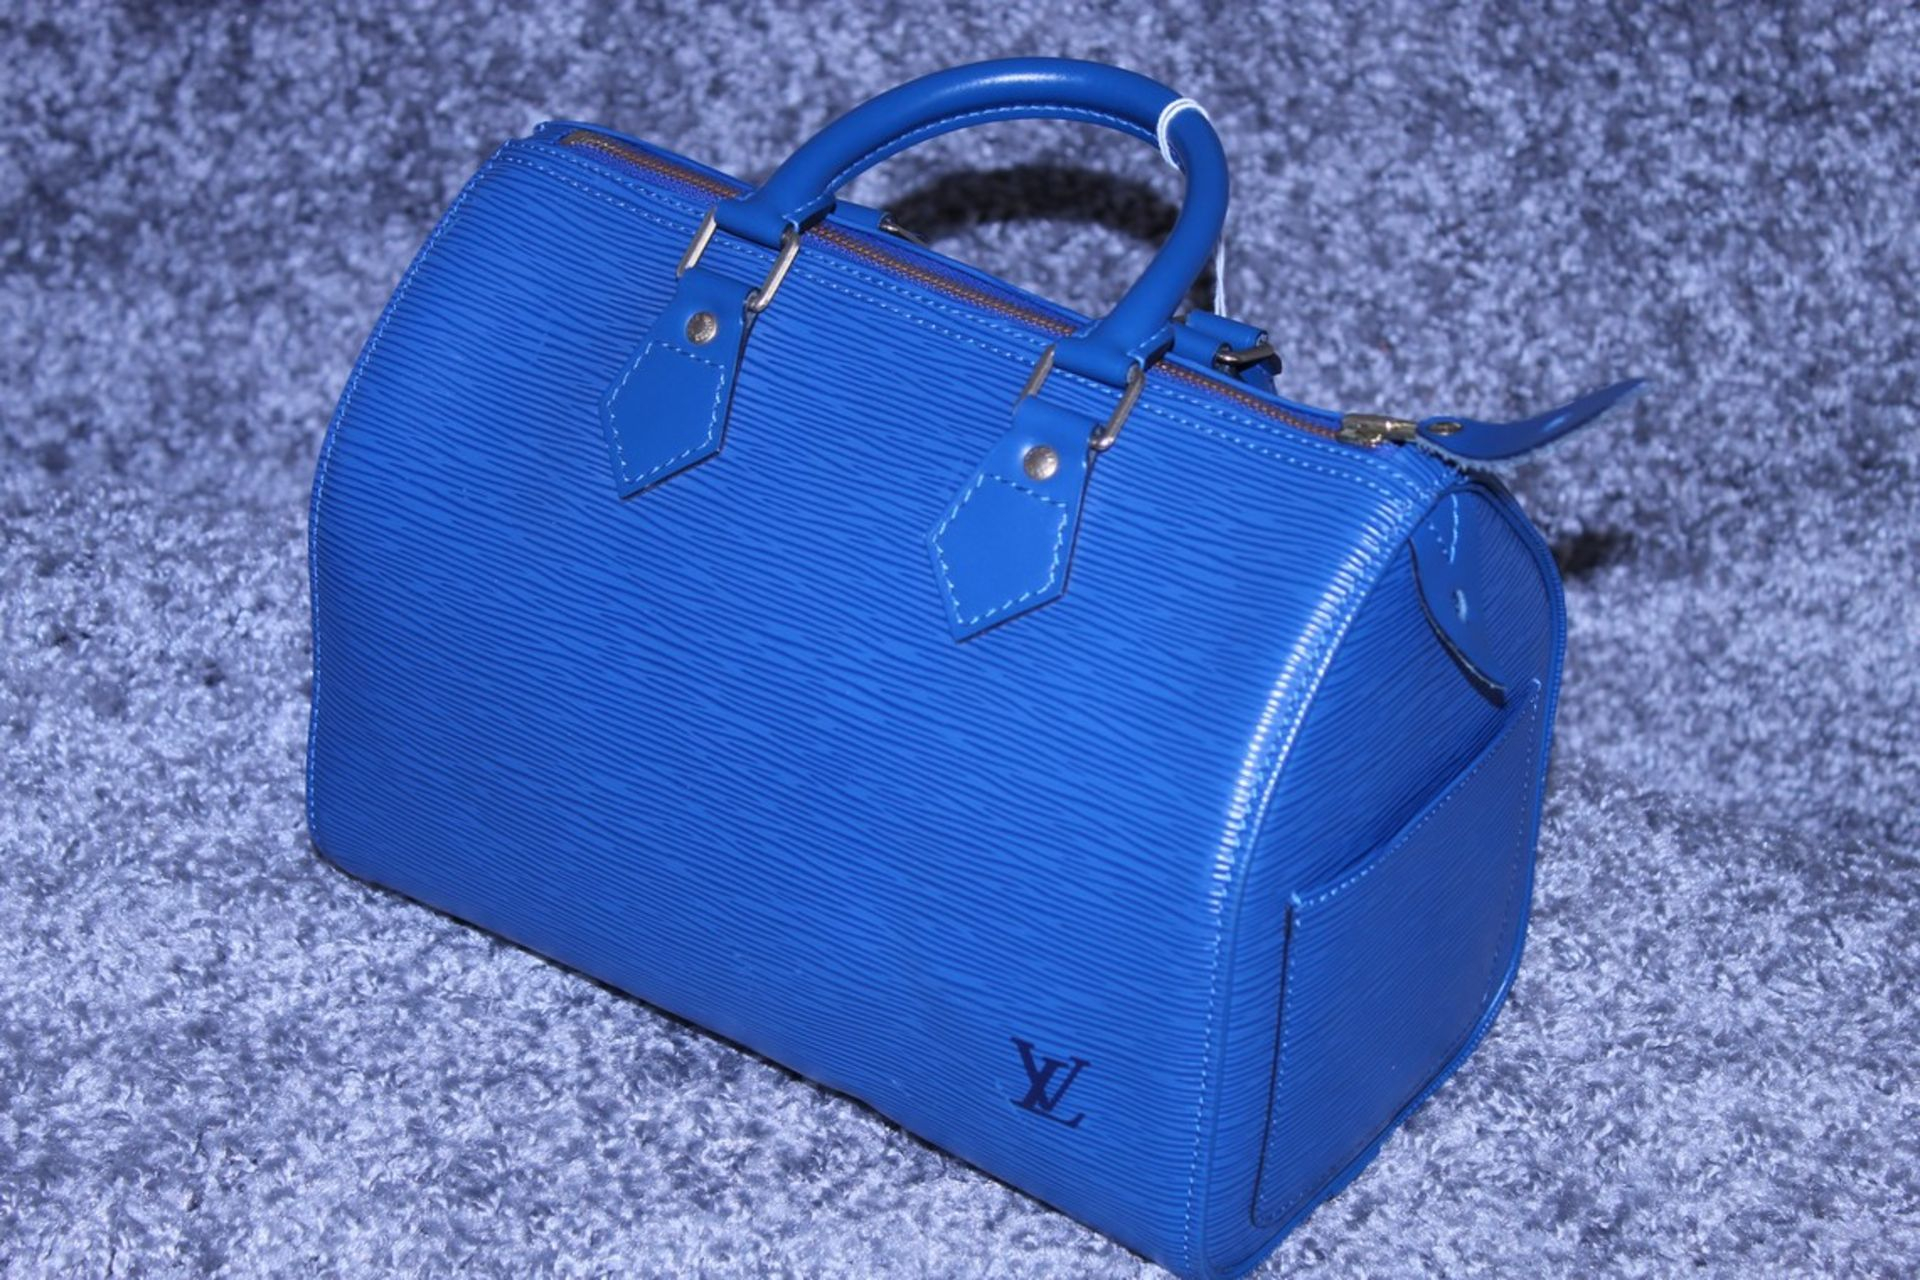 RRP £1,000 Louis Vuitton Speedy 25 Handbag, Blue Epi Calf Leather, 27X19X15Cm (Production Code - Image 3 of 3